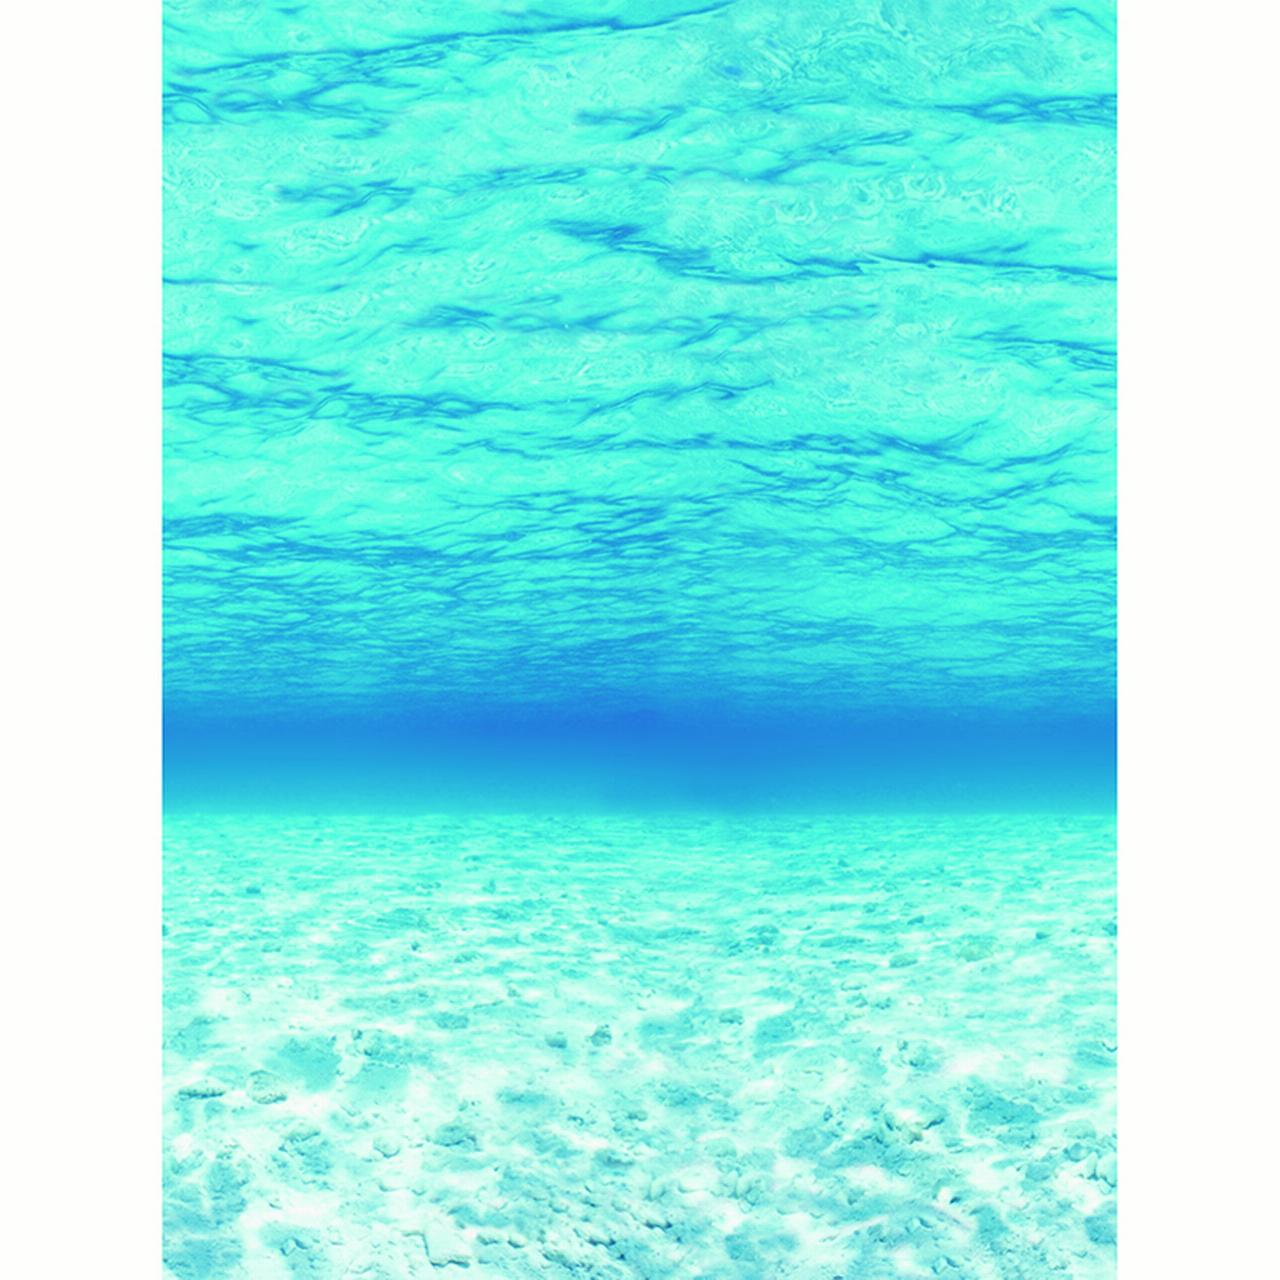 Fadeless 48X12 Under The Sea 4Rls - image 1 de 1